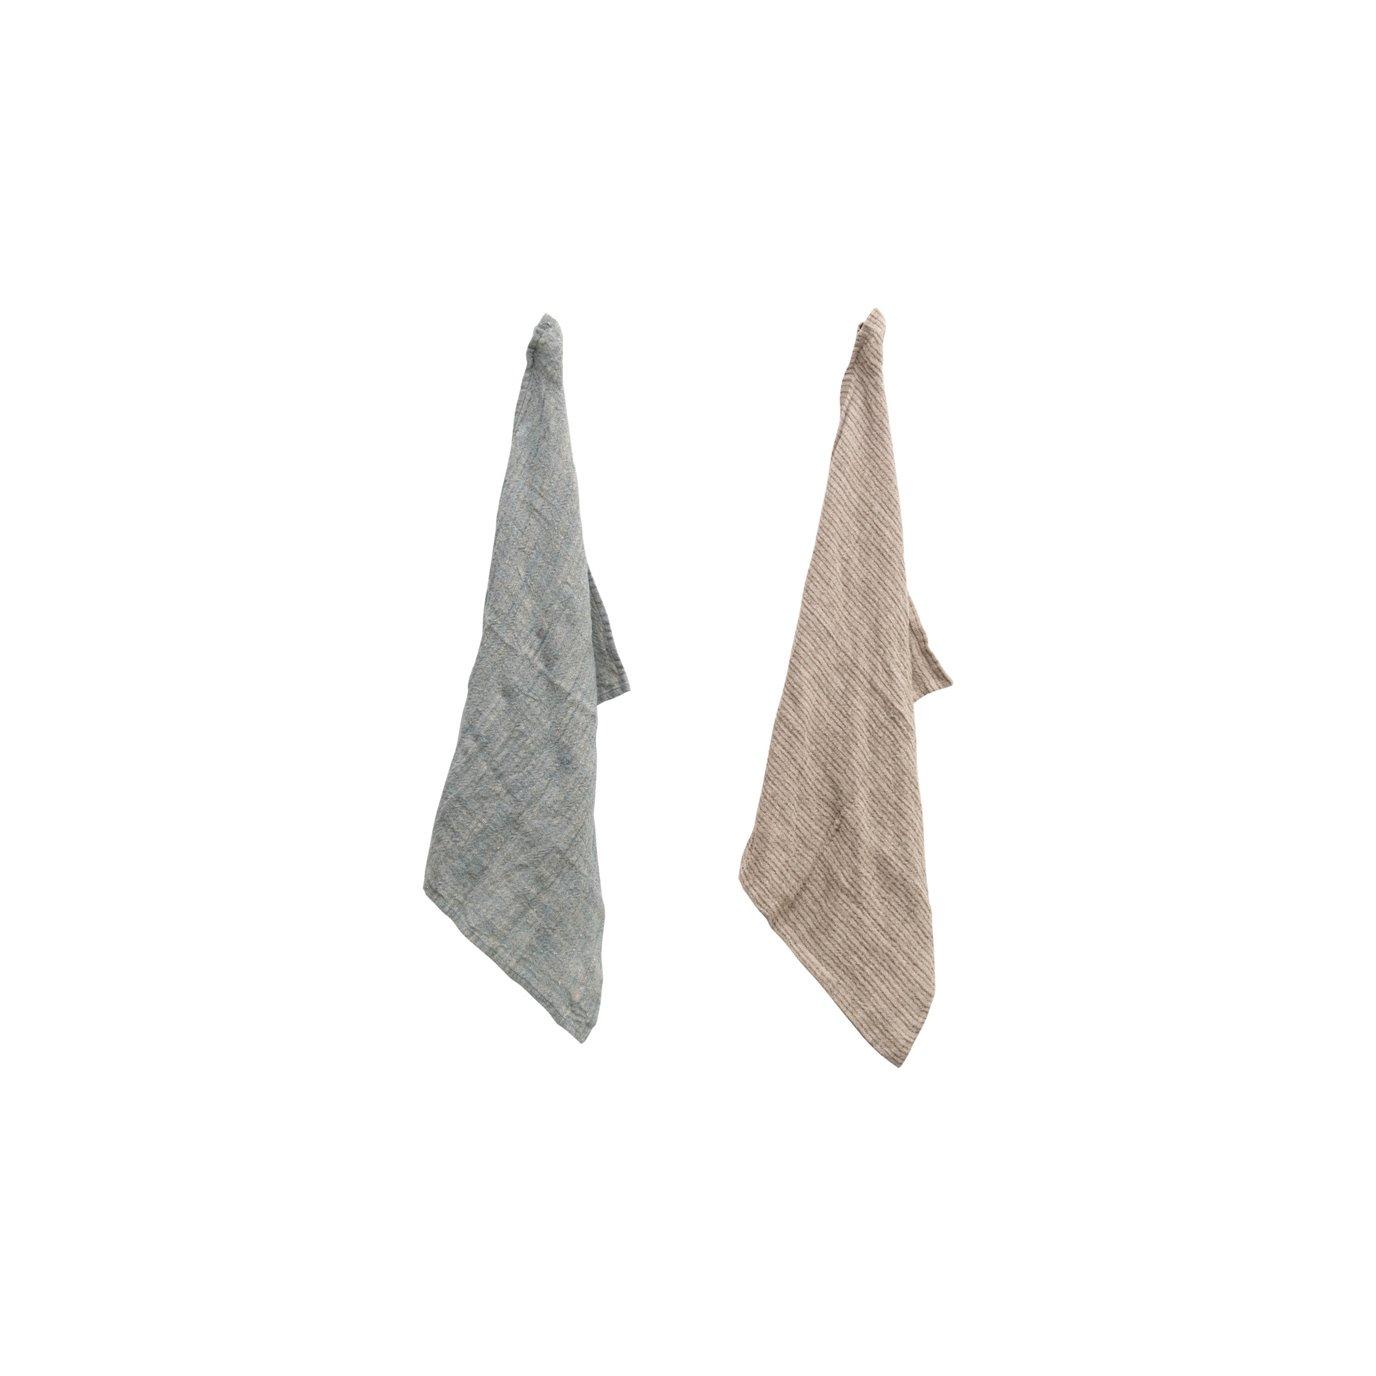 Woven Linen Striped Tea Towel, 2 Colors